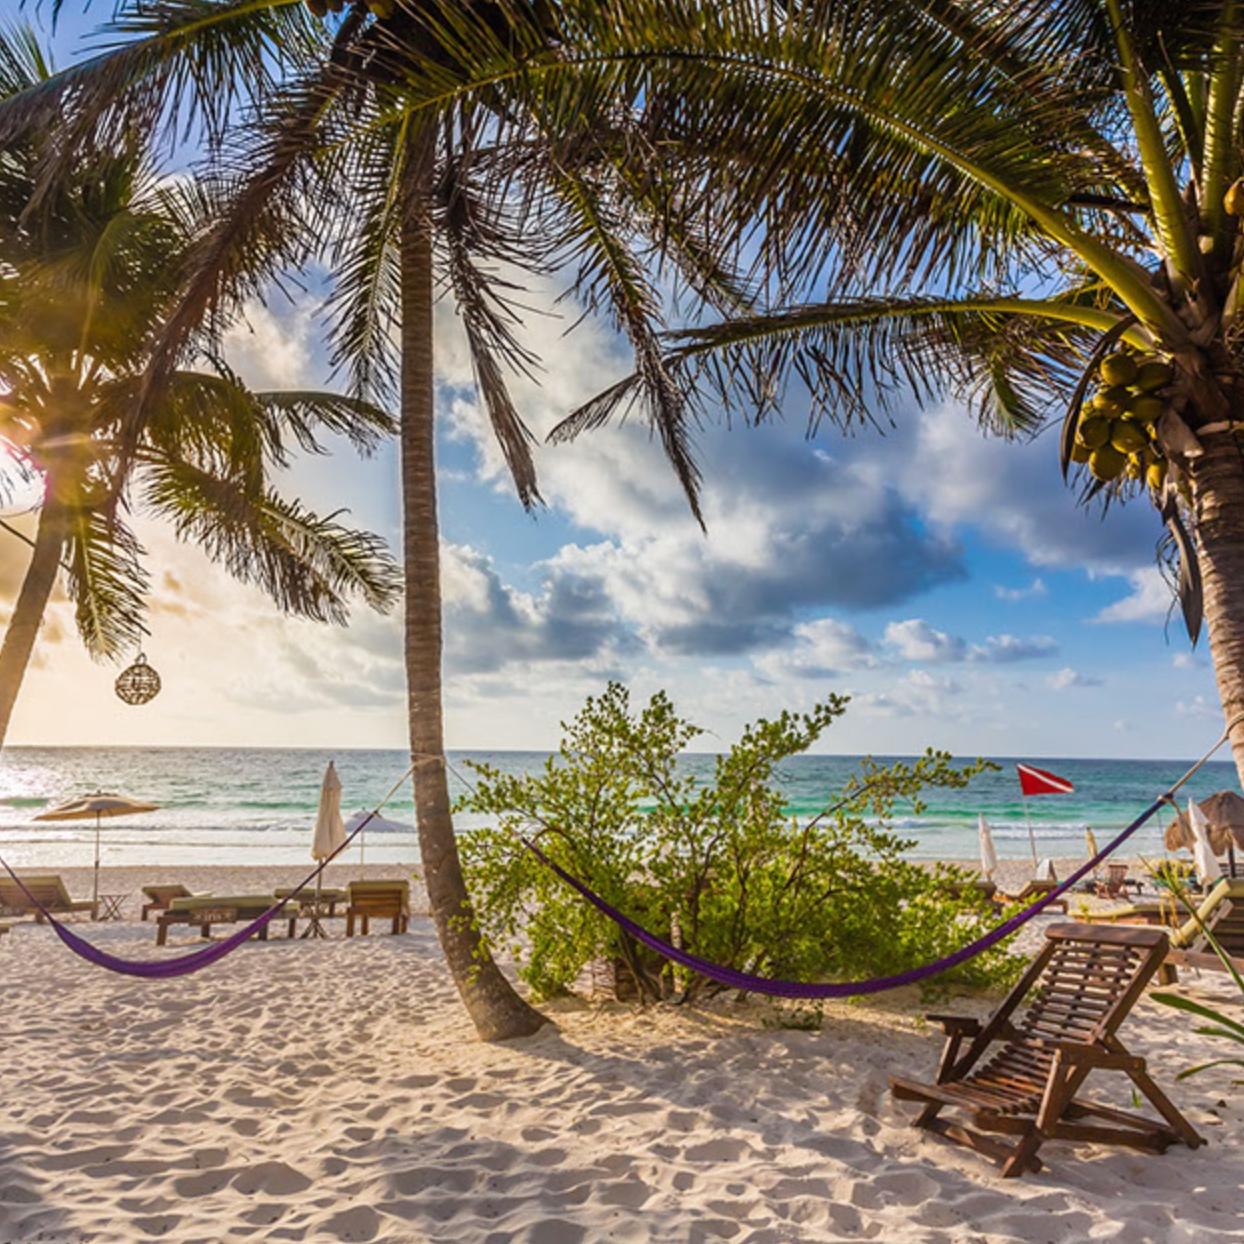 lazy wellness winter retreat - February 14-19Tulum, MXYoga, meditation, astrology, plant-based menu, beachside relaxation!Hosted by Megan Cuzzolino